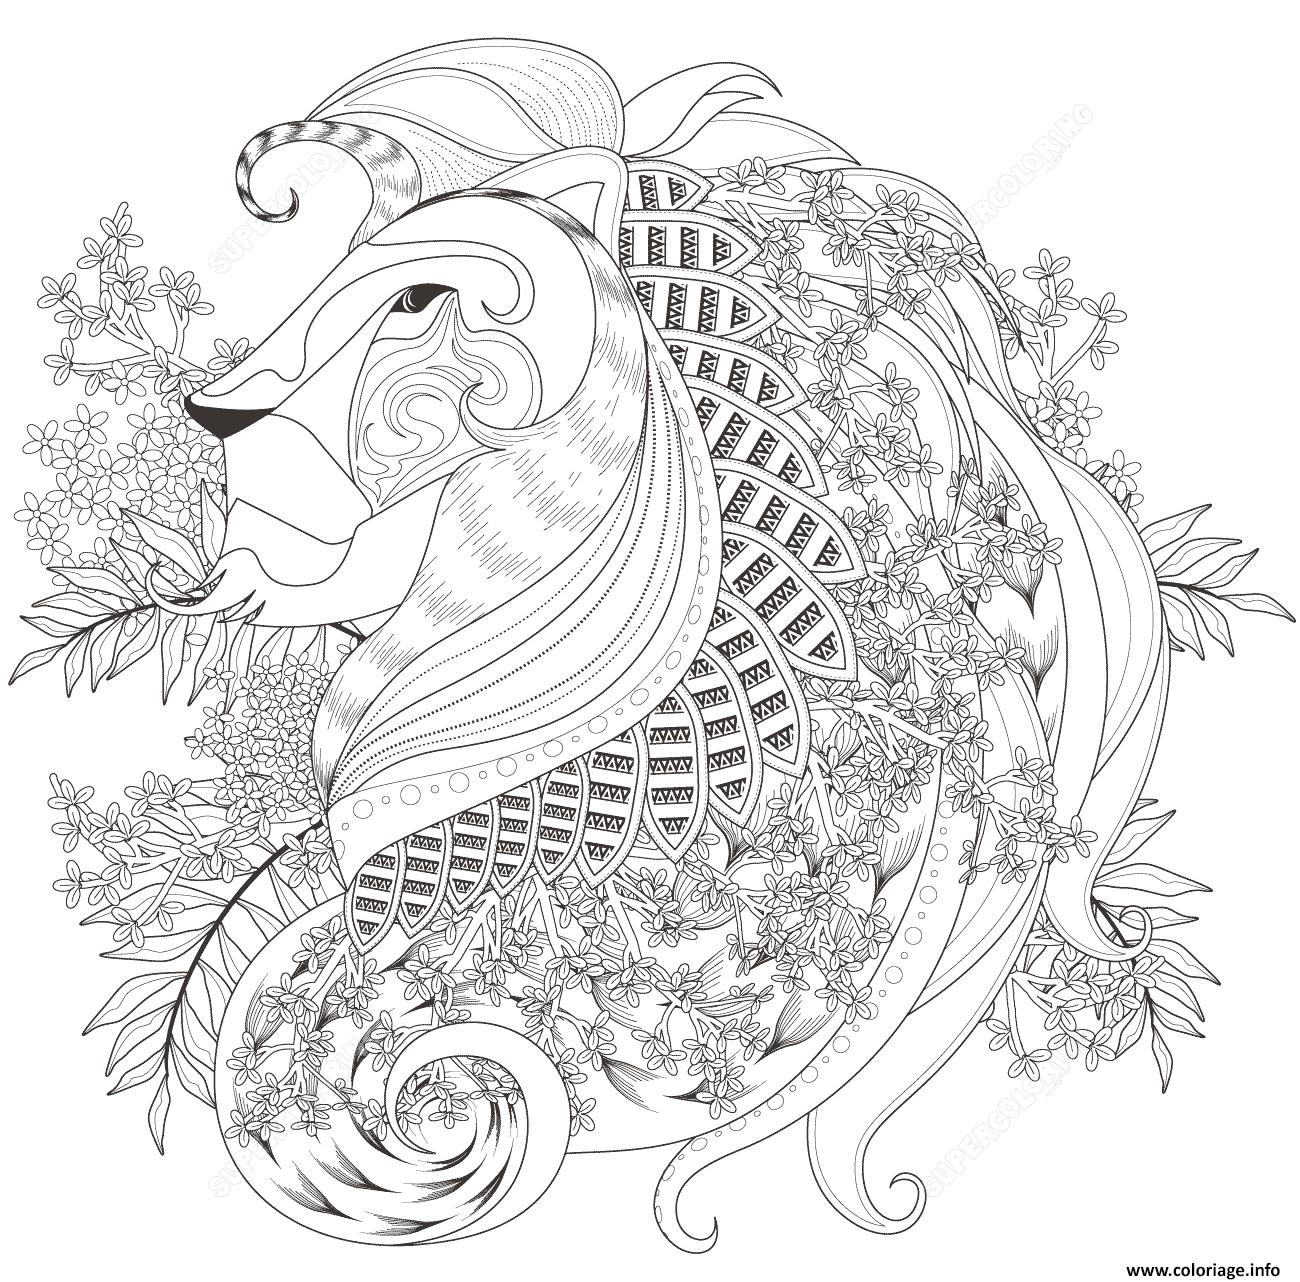 Coloriage Adulte Volcan.Coloriage Zentagle Lion With Floral Elements Adulte Dessin